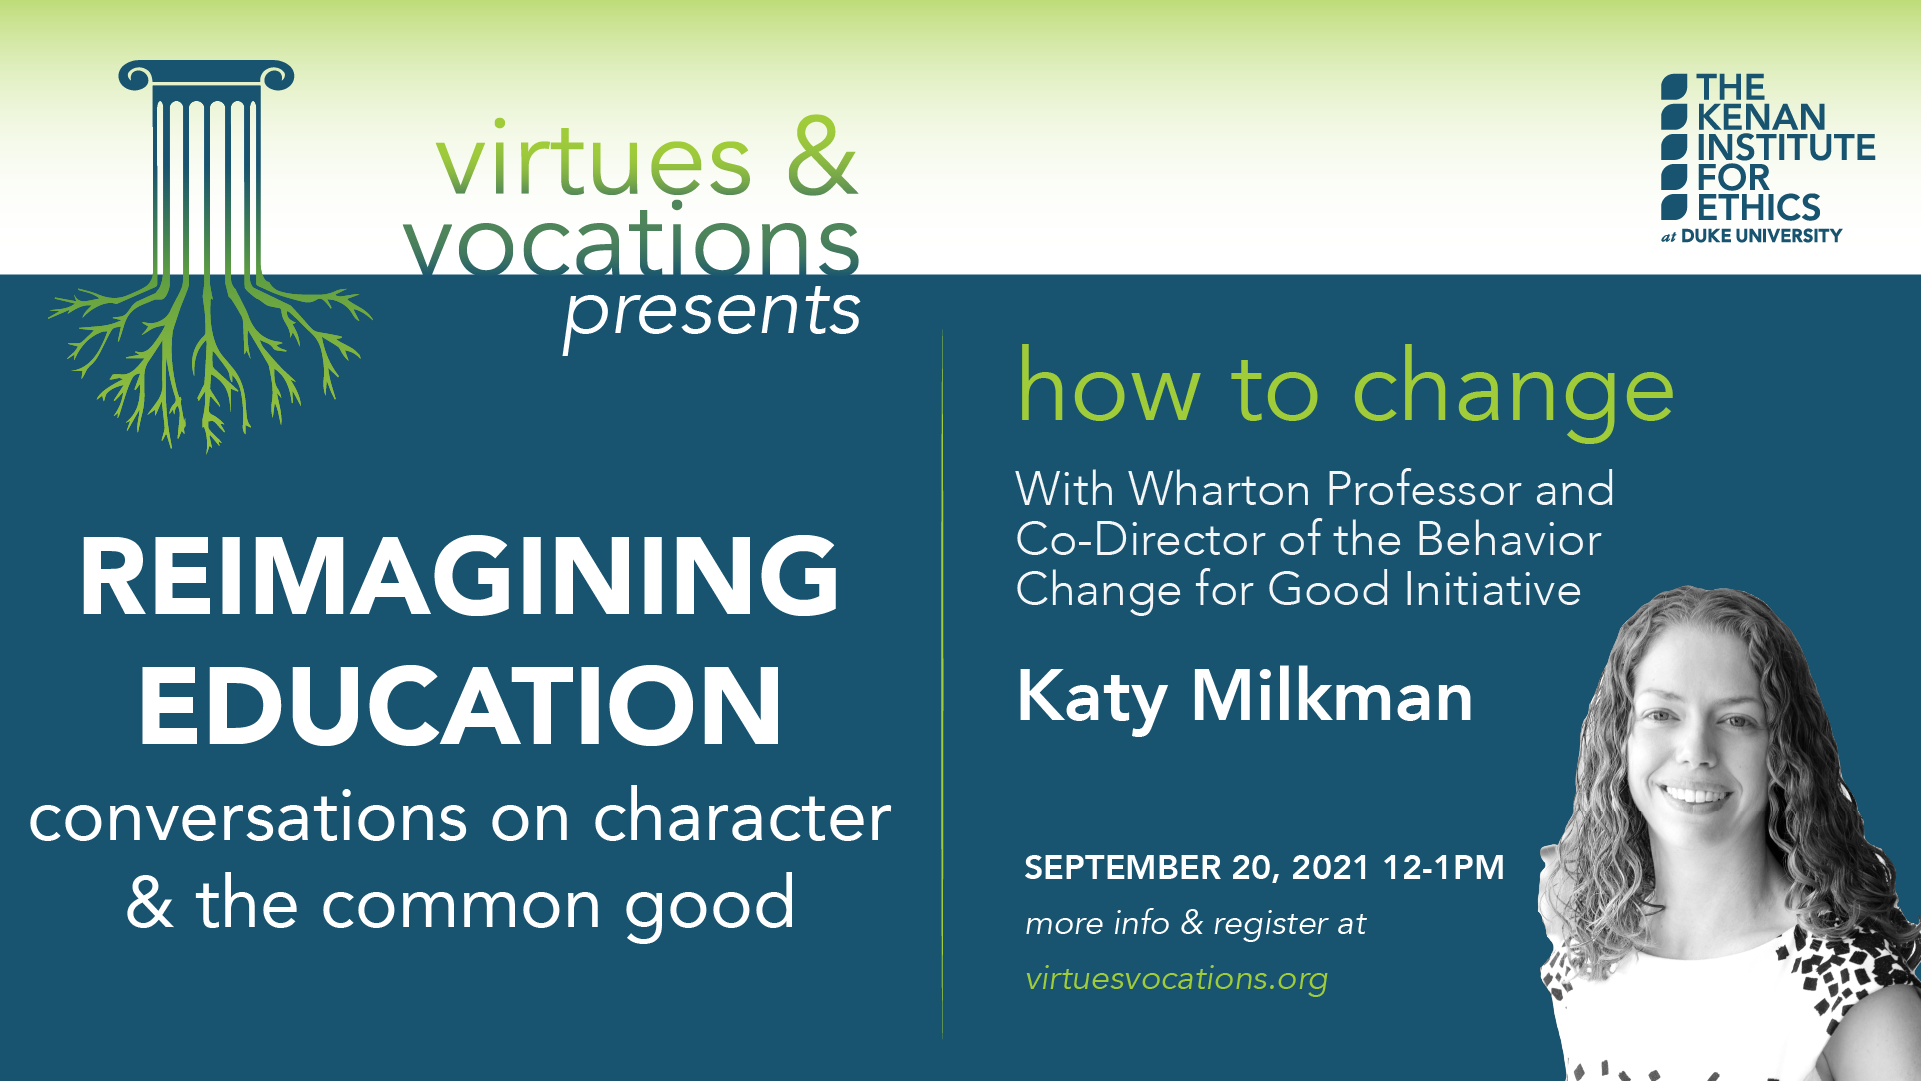 reimagining education w/ katy milkman